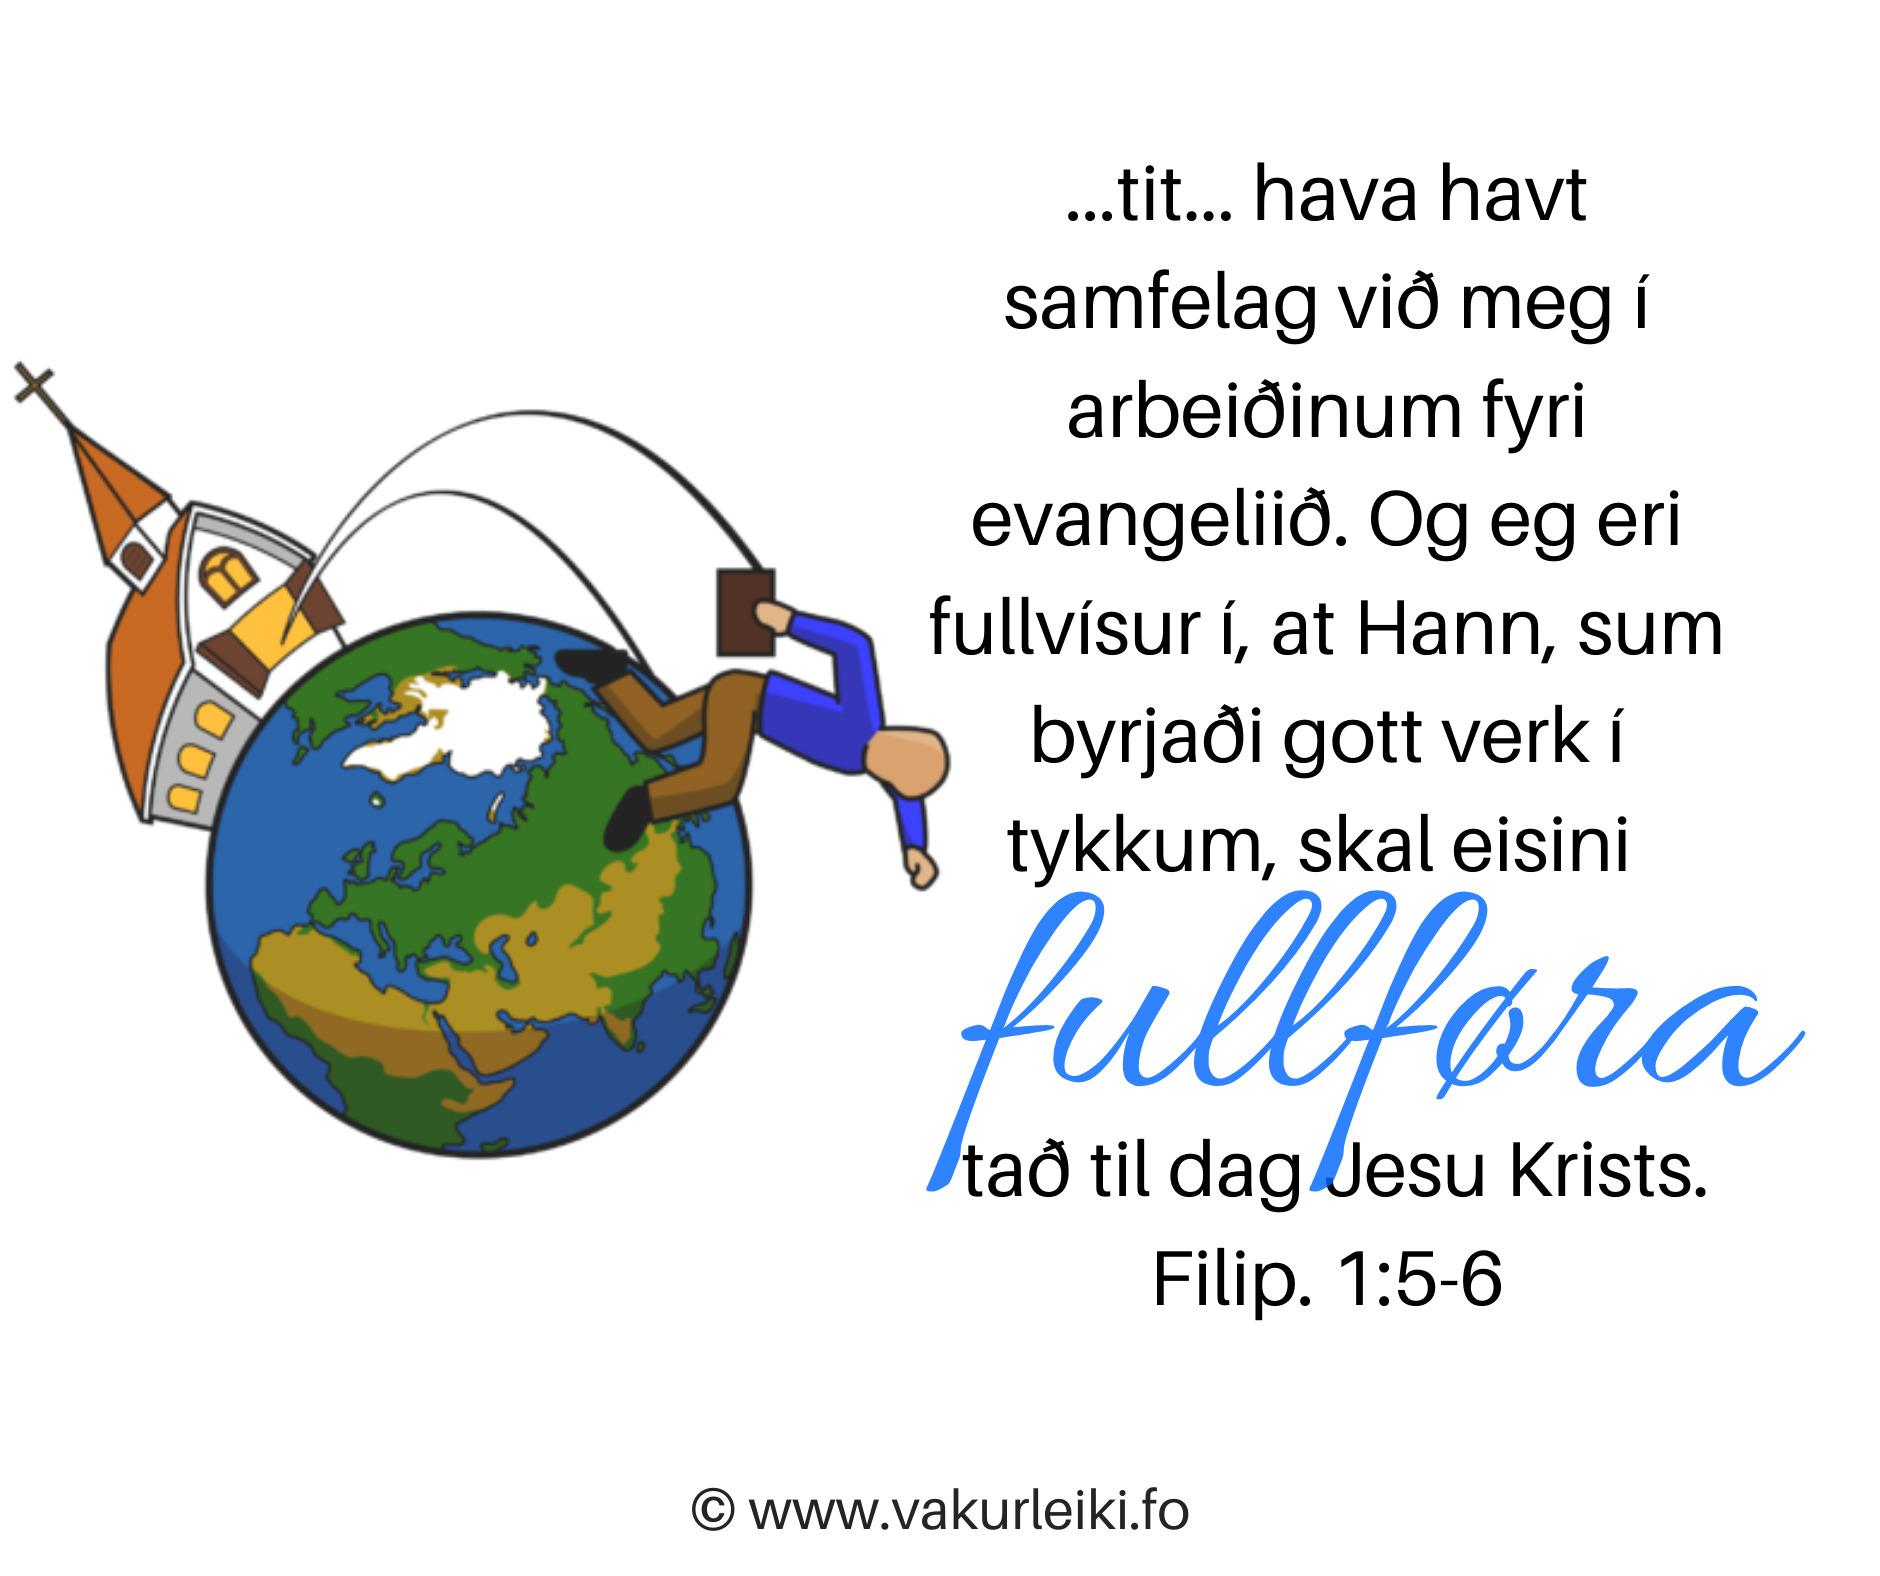 Filip.1.5,6